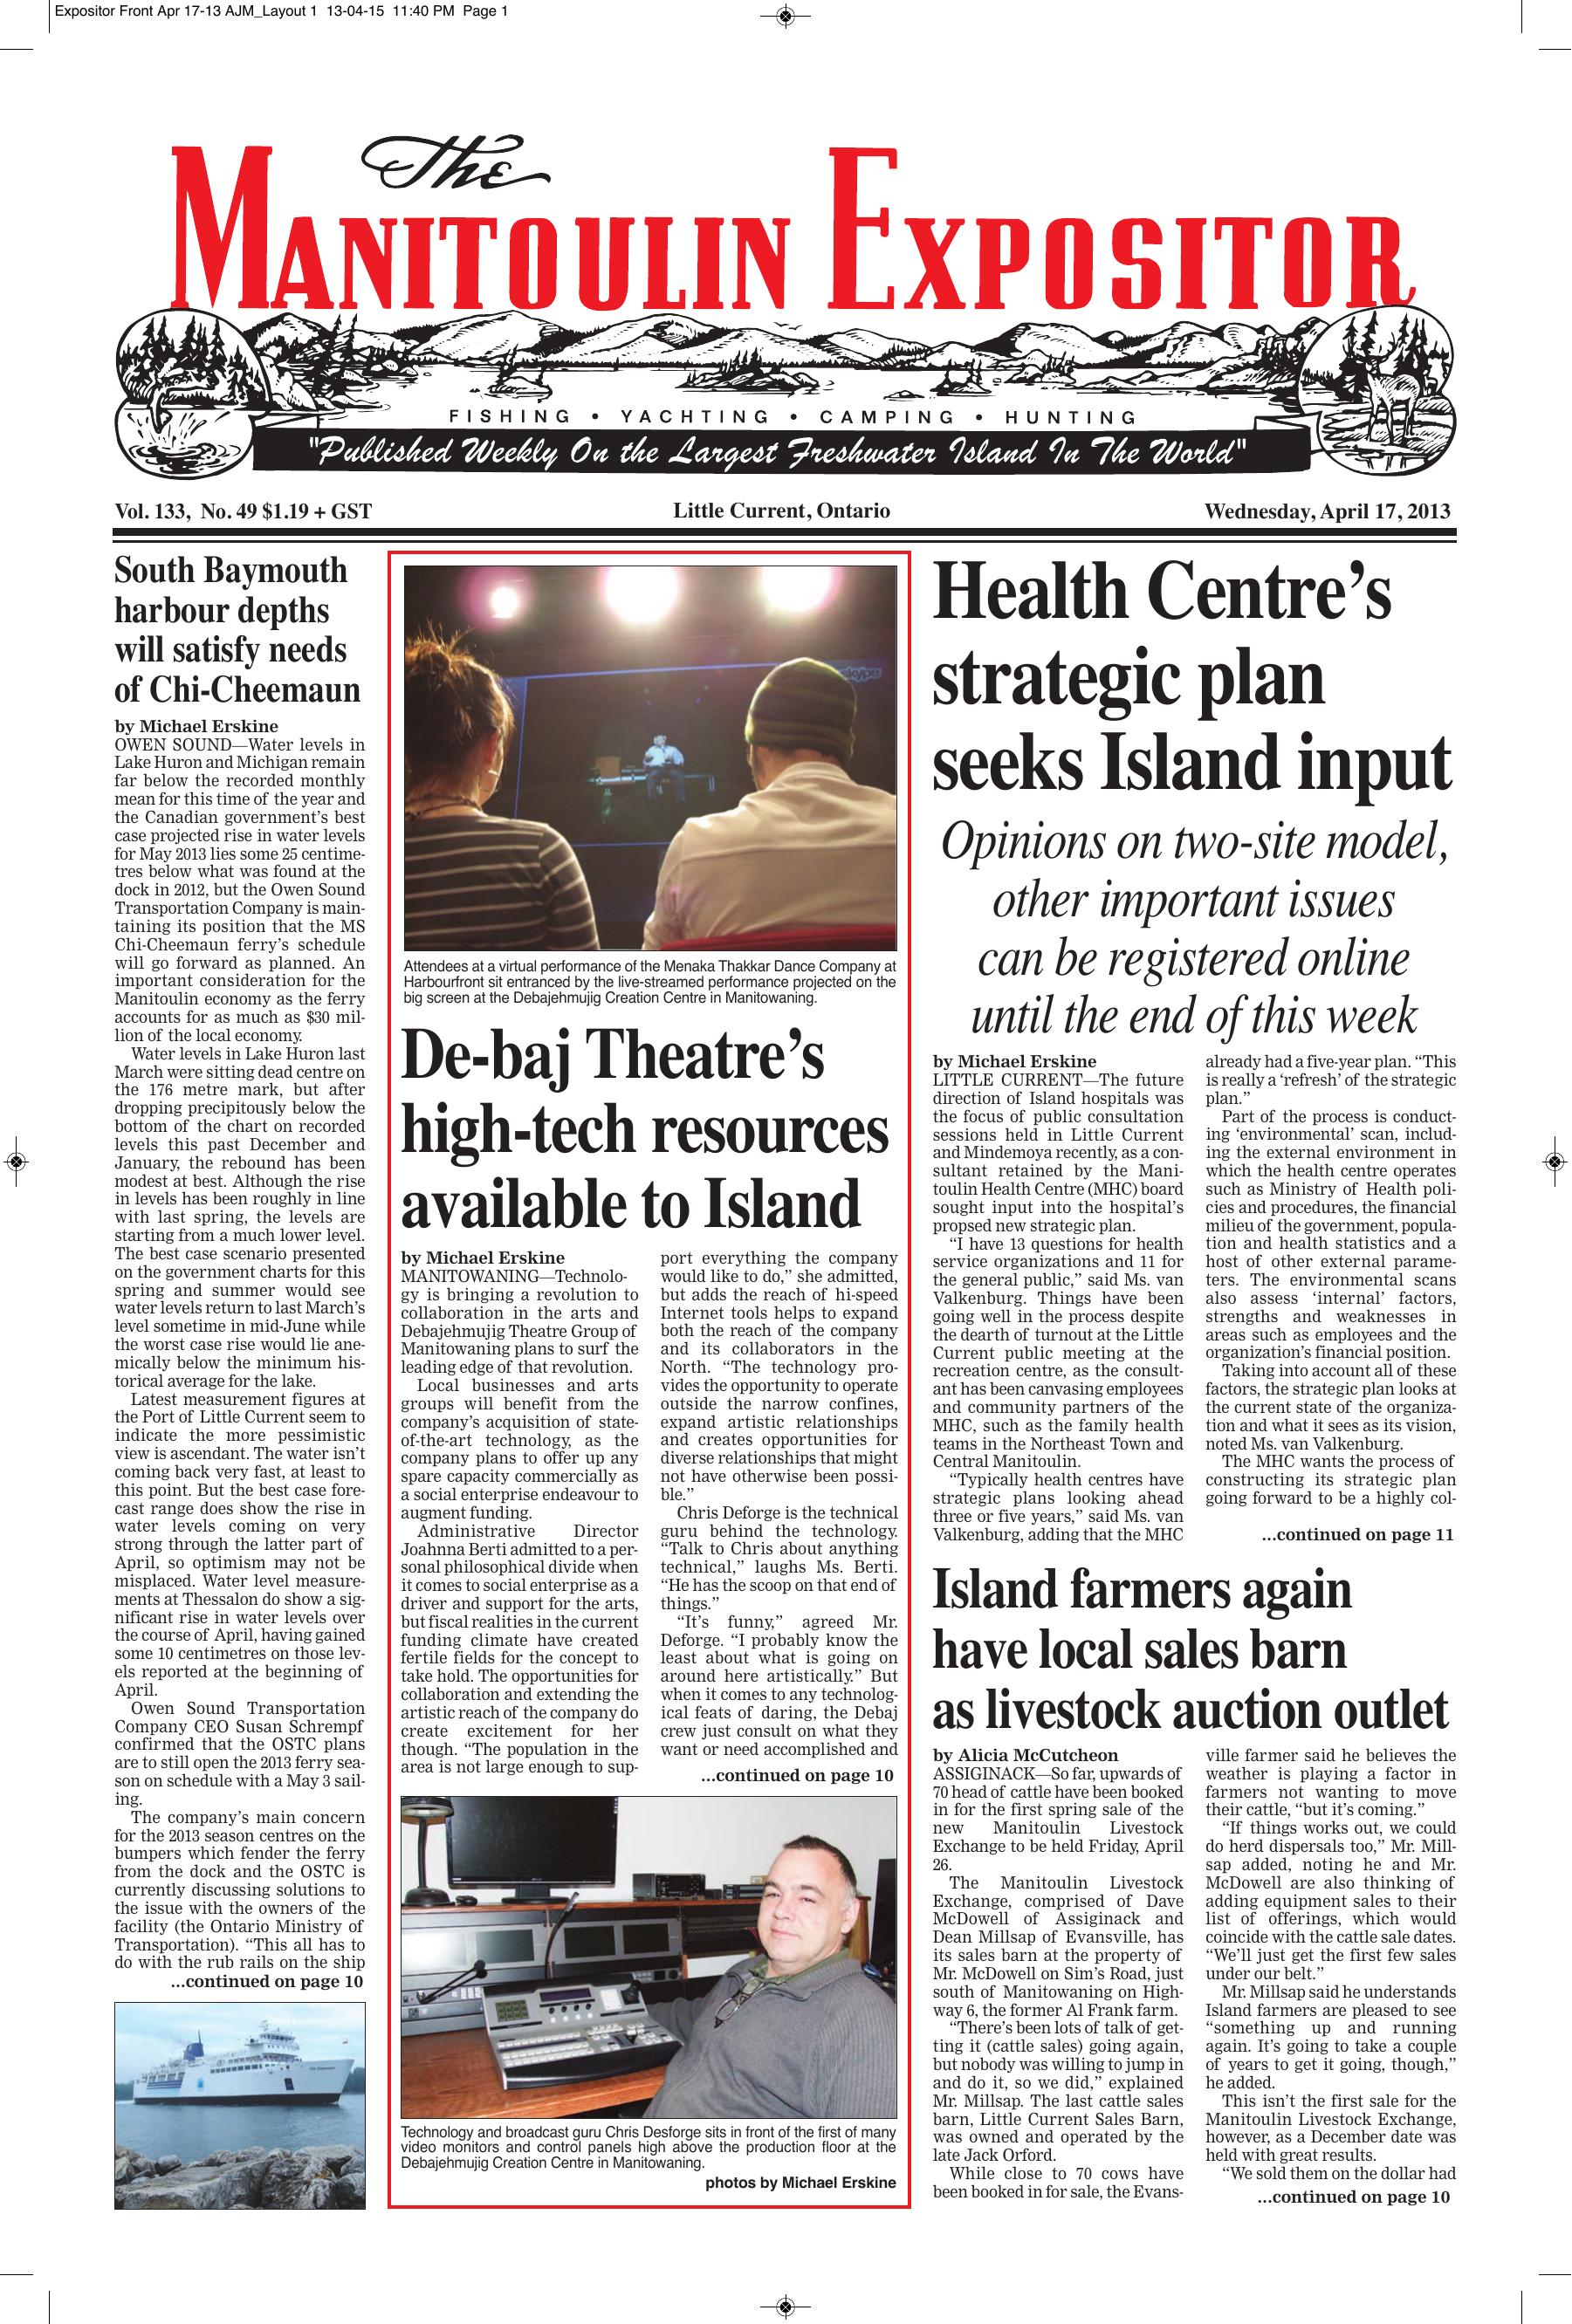 Health Centres Strategic Plan Seeks Island Input Manualzzcom